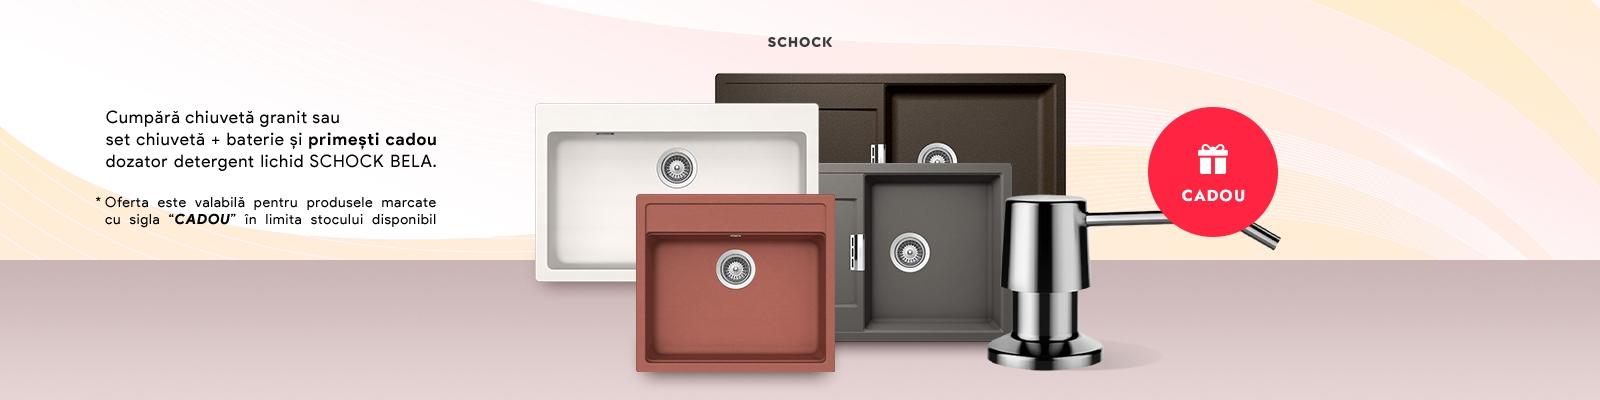 CADOU - Dozator Detergent Lichid Schock Bela